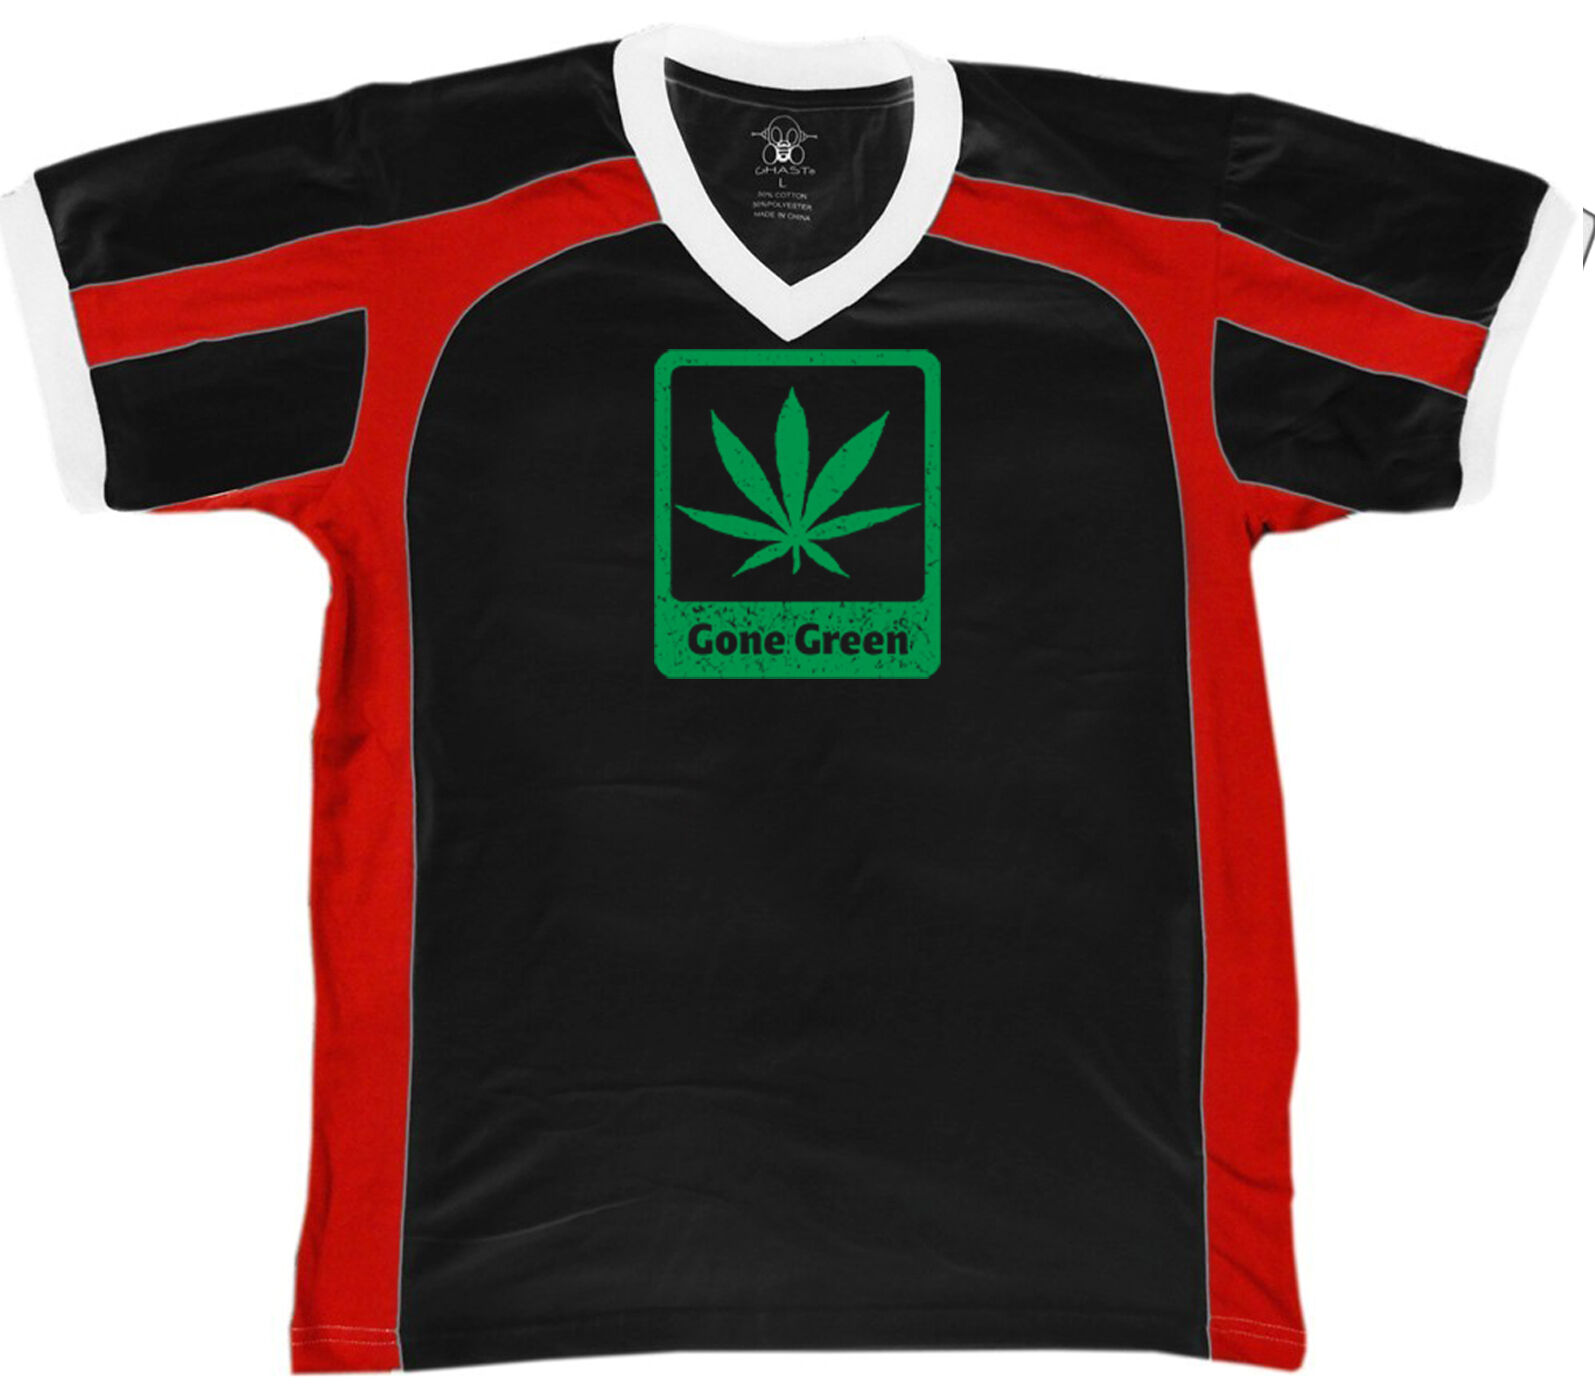 Gone Green Stoner Weed Mary J Marijuana Toke Blunt Funny Retro Sport T-shirt 1